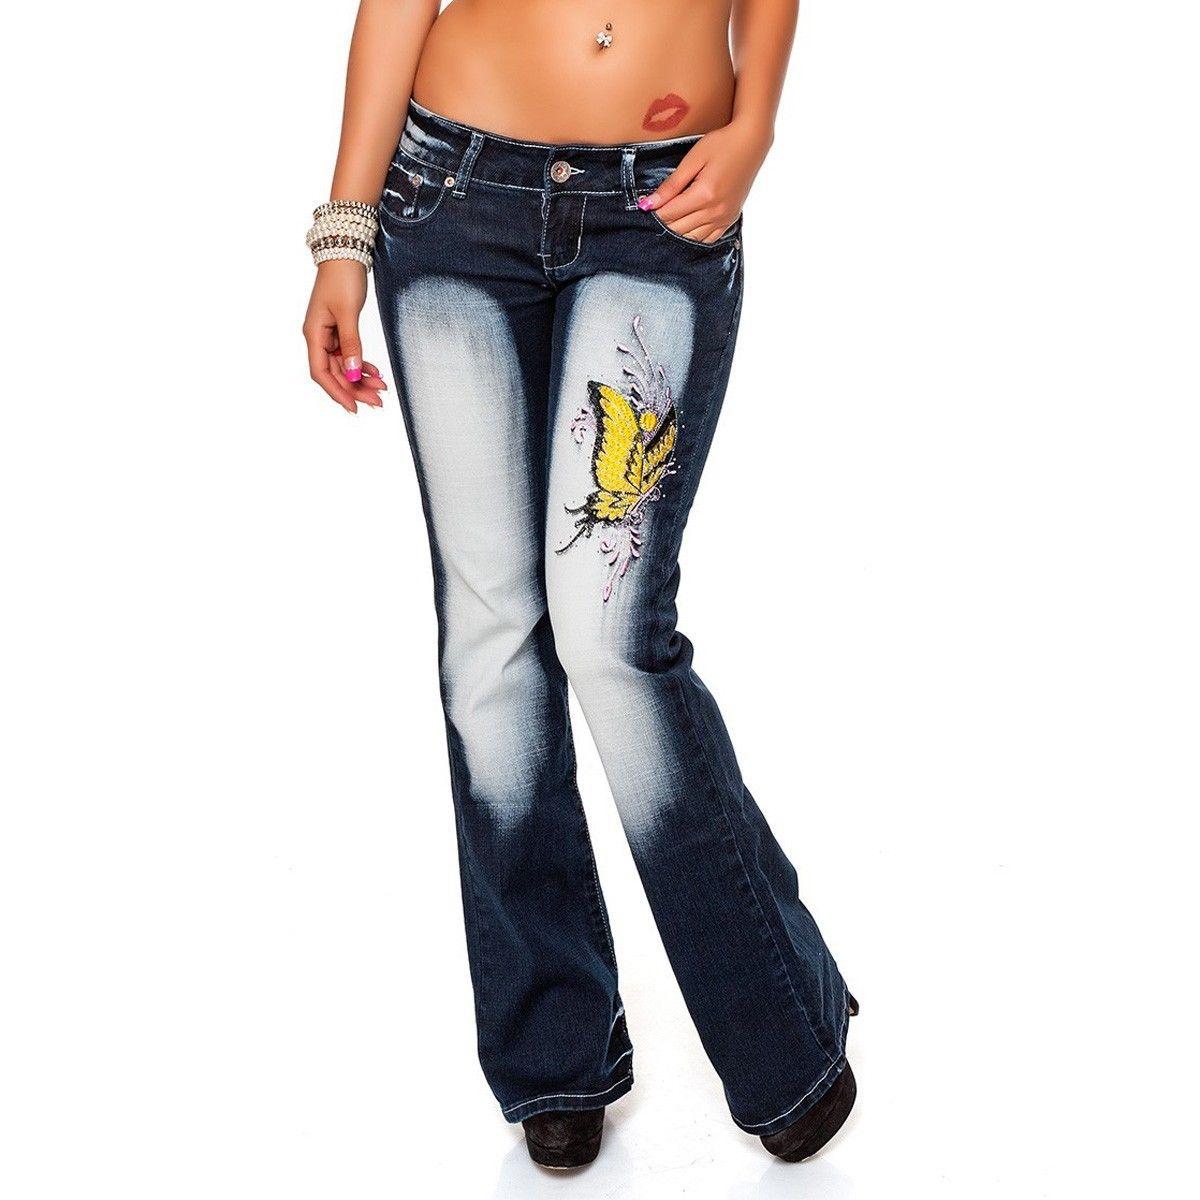 Dámské jeans CRAZY AGE - vel. 40 297625bb2a